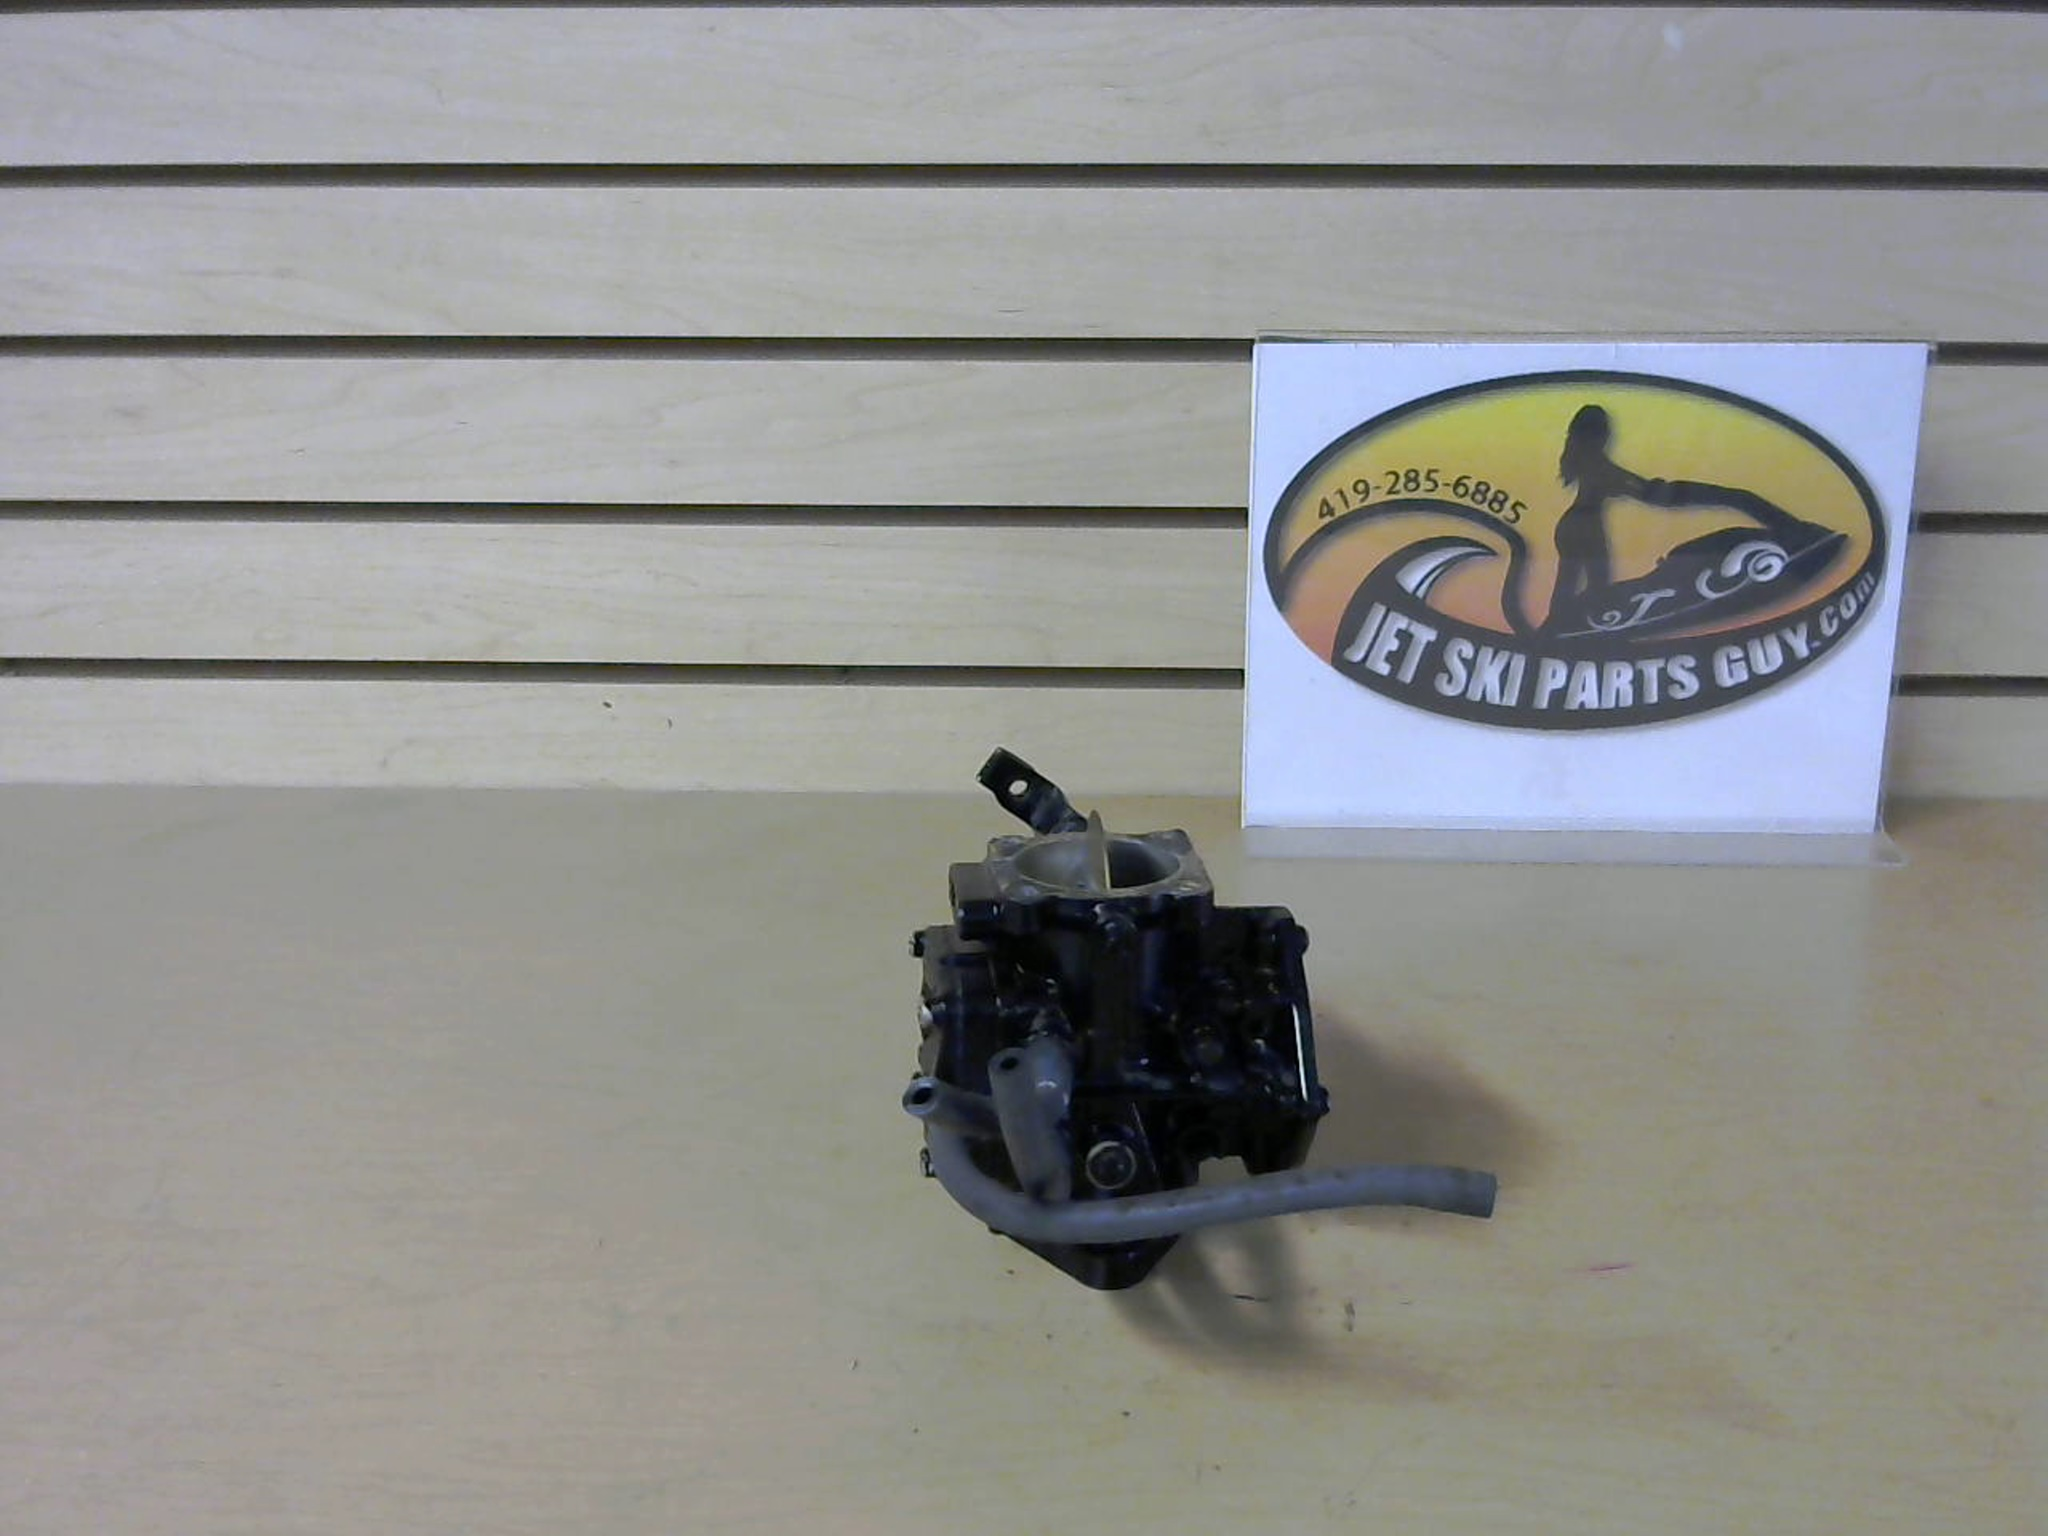 1993 Yamaha Waverunner 3 650RA Carburetor Assembly 6R8-14301-02-00 - Used  Jetski Parts - jetskipartsguy com